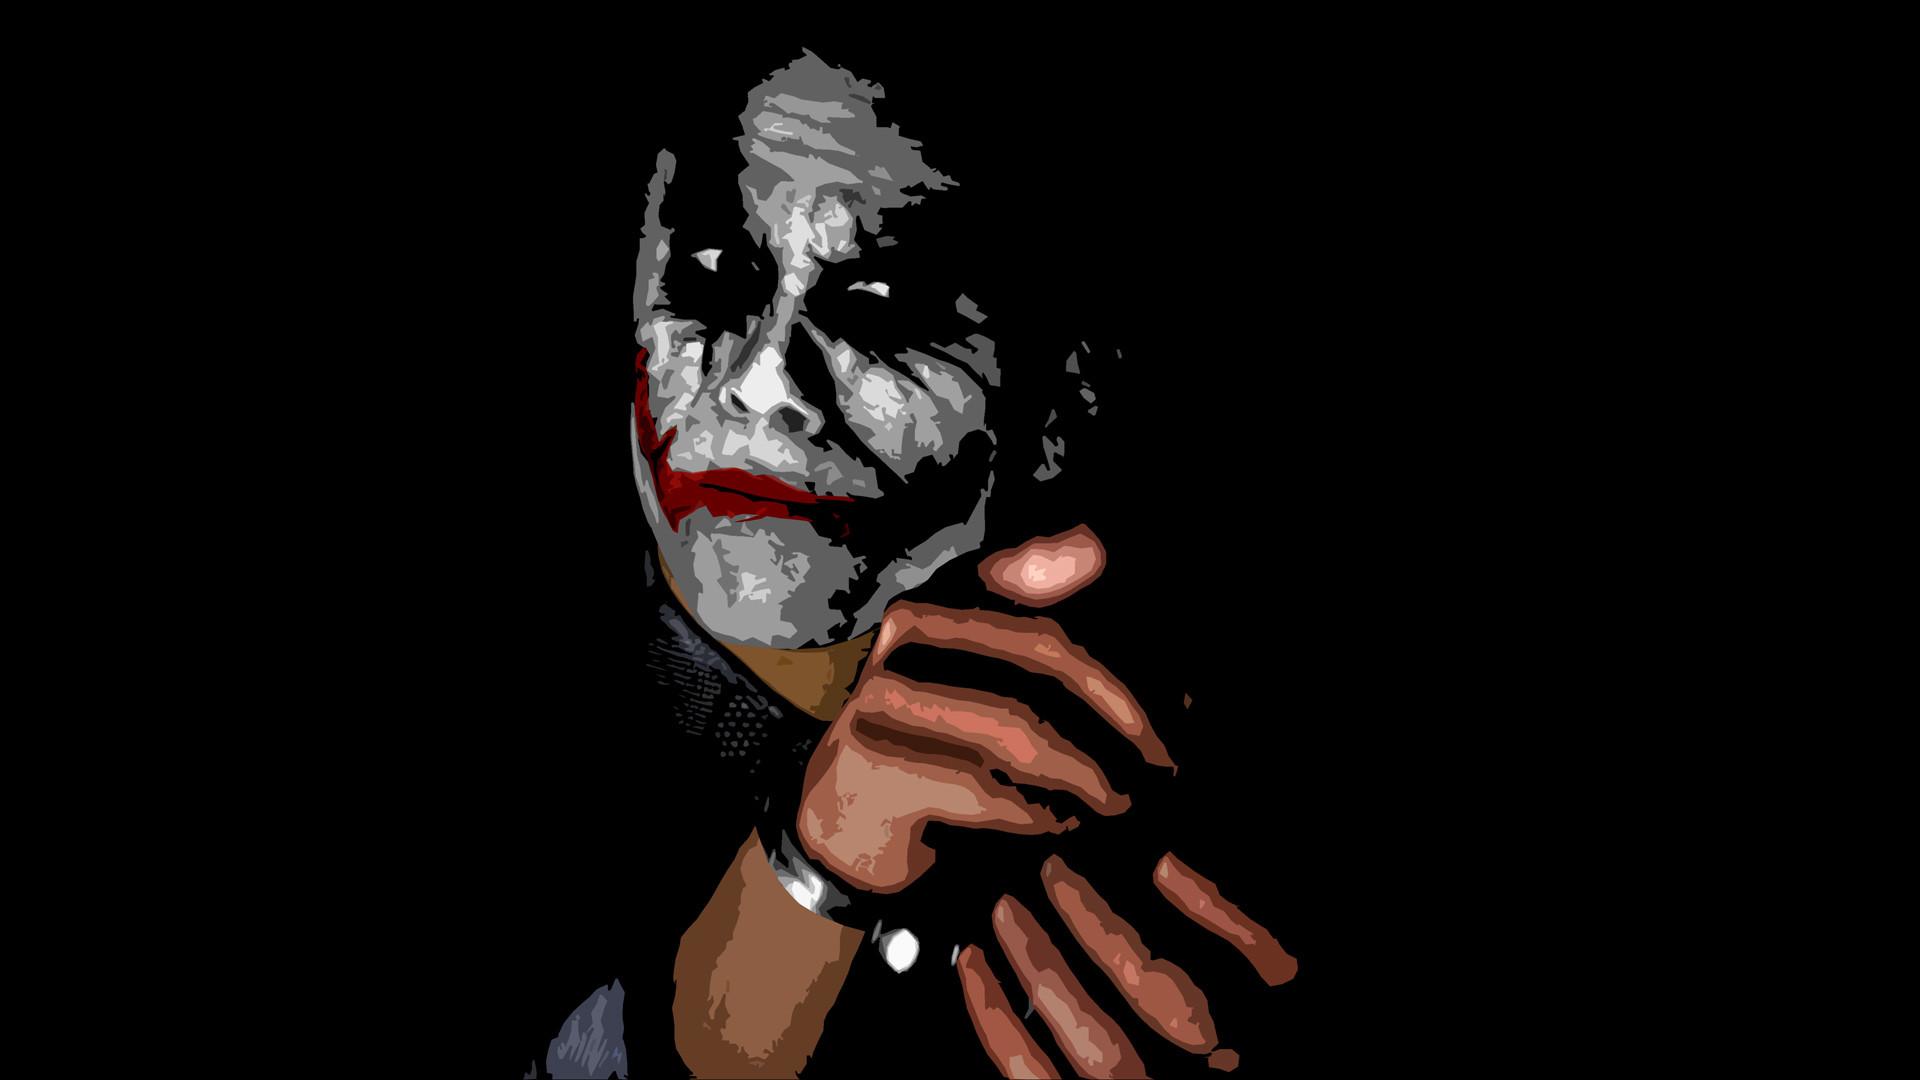 Joker Wallpaper HD Windows 10 – WallpaperSafari